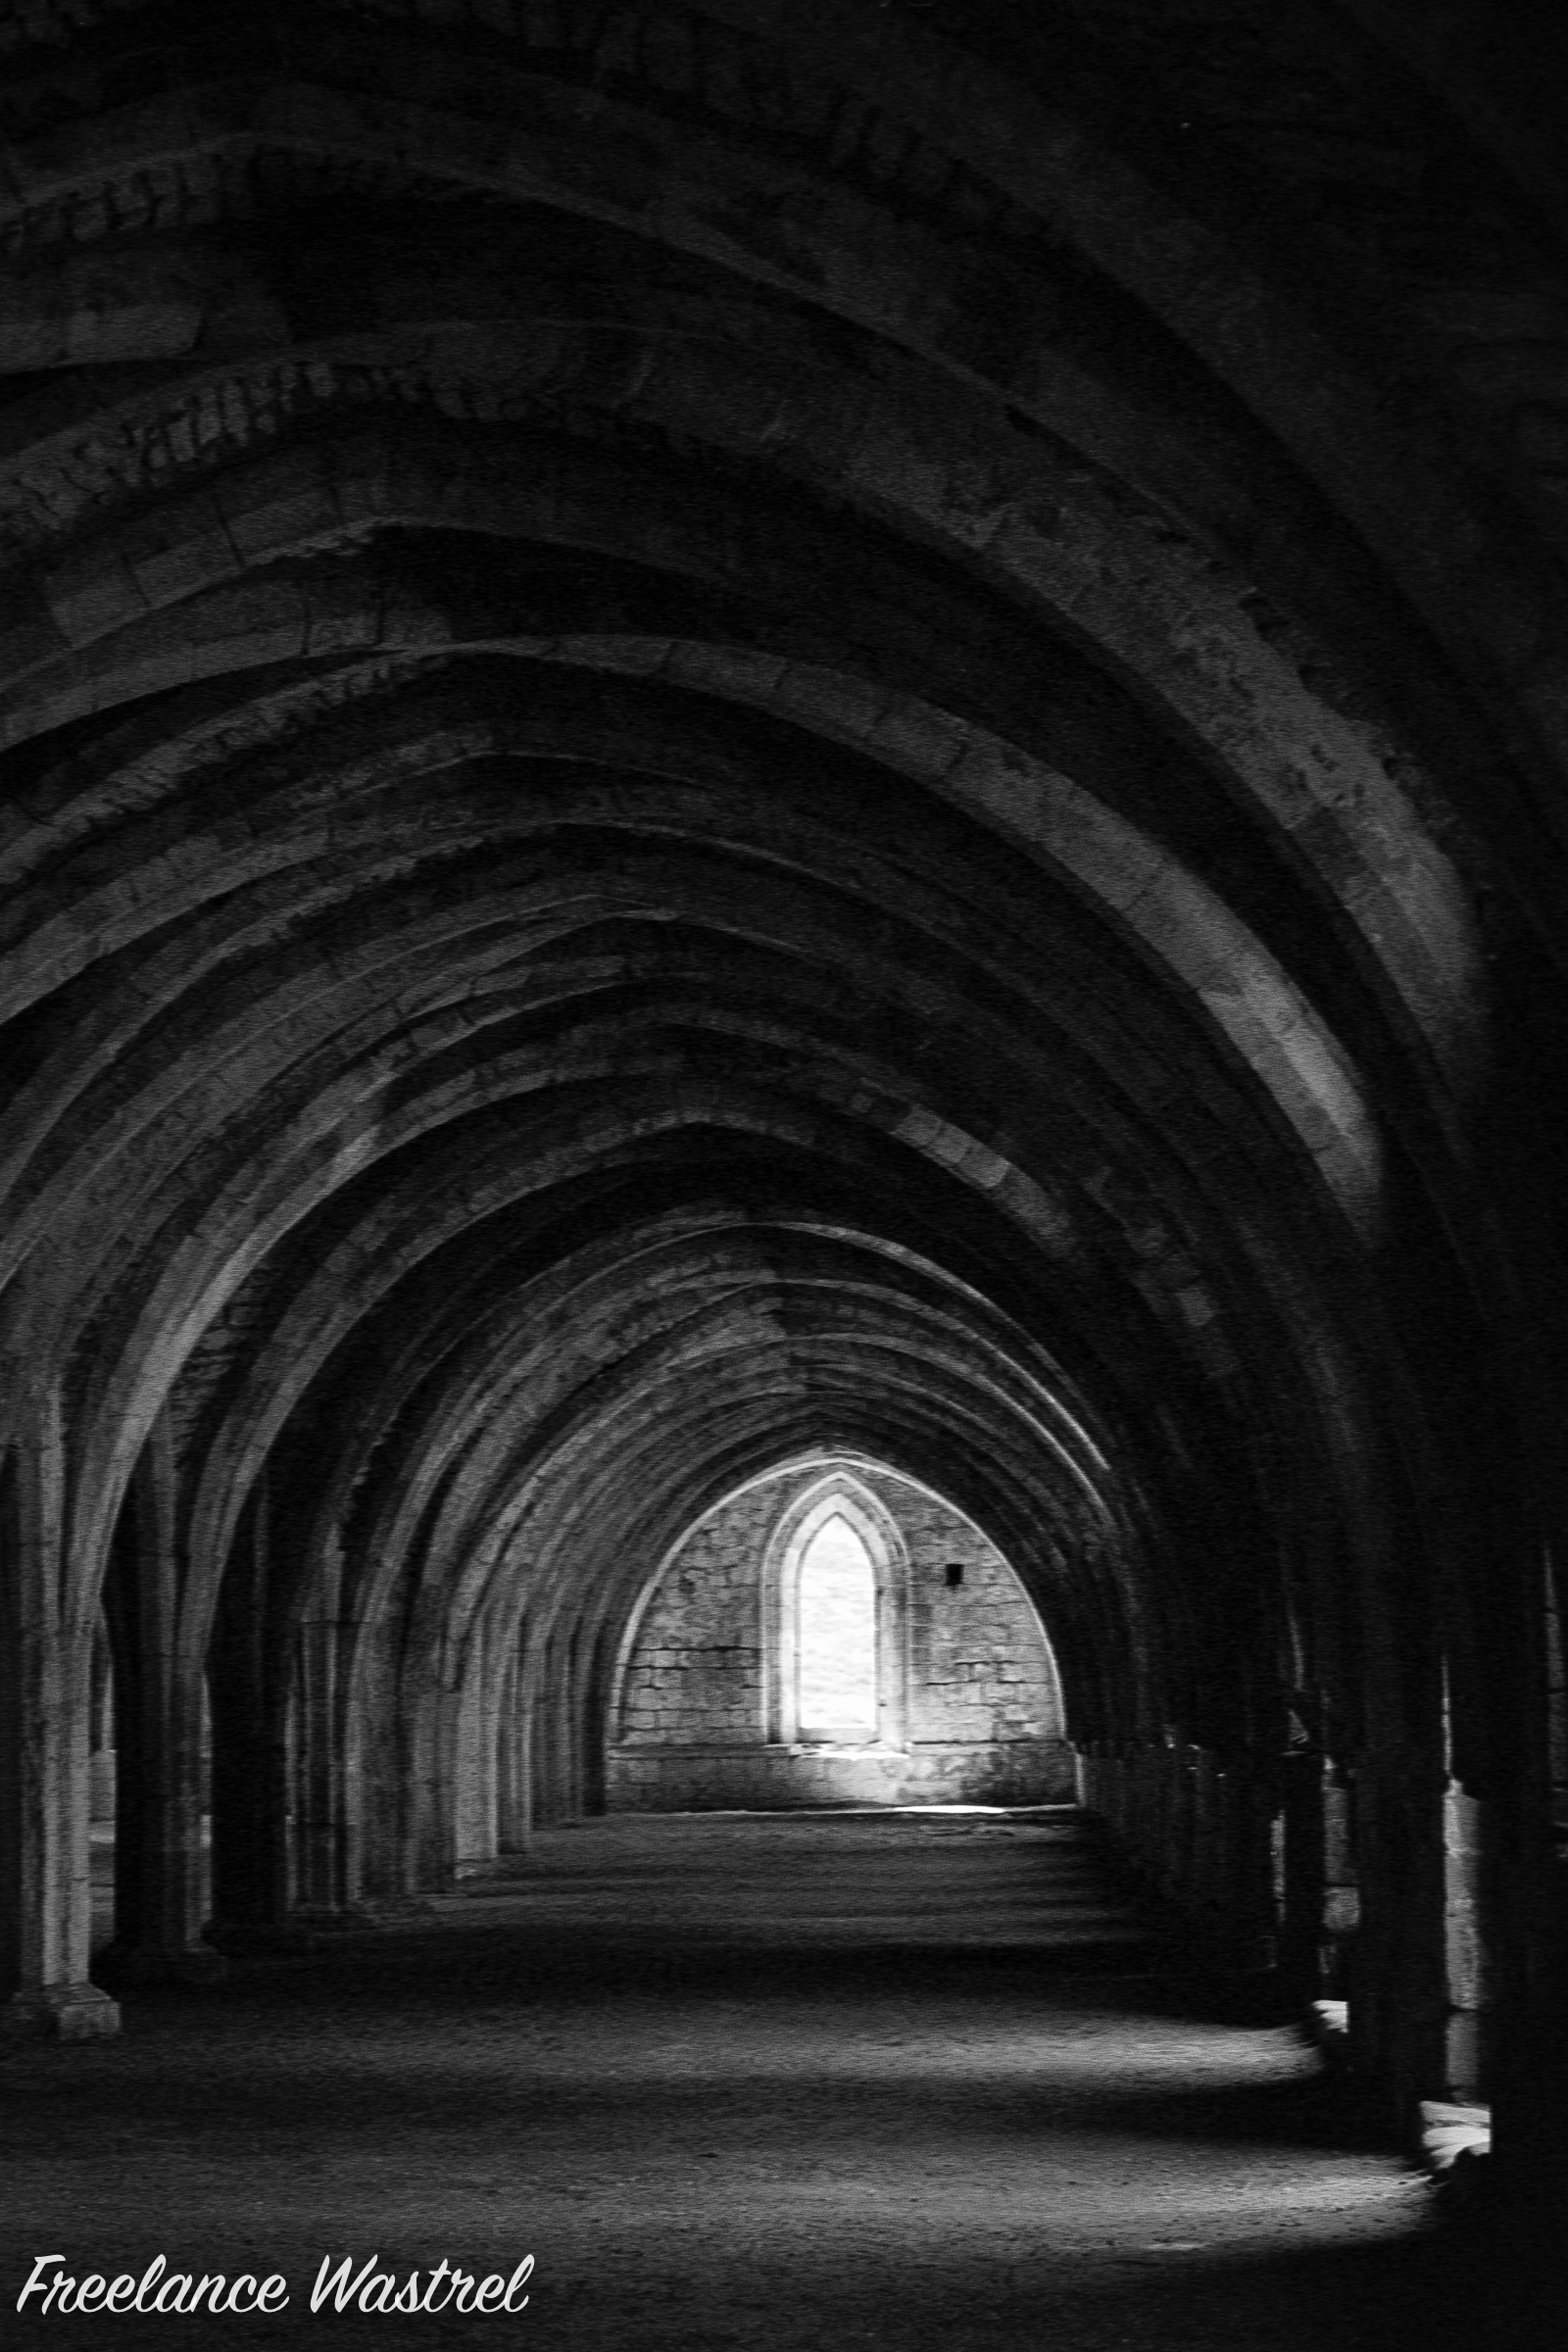 Illumination, The Cellarium, Fountains Abbey